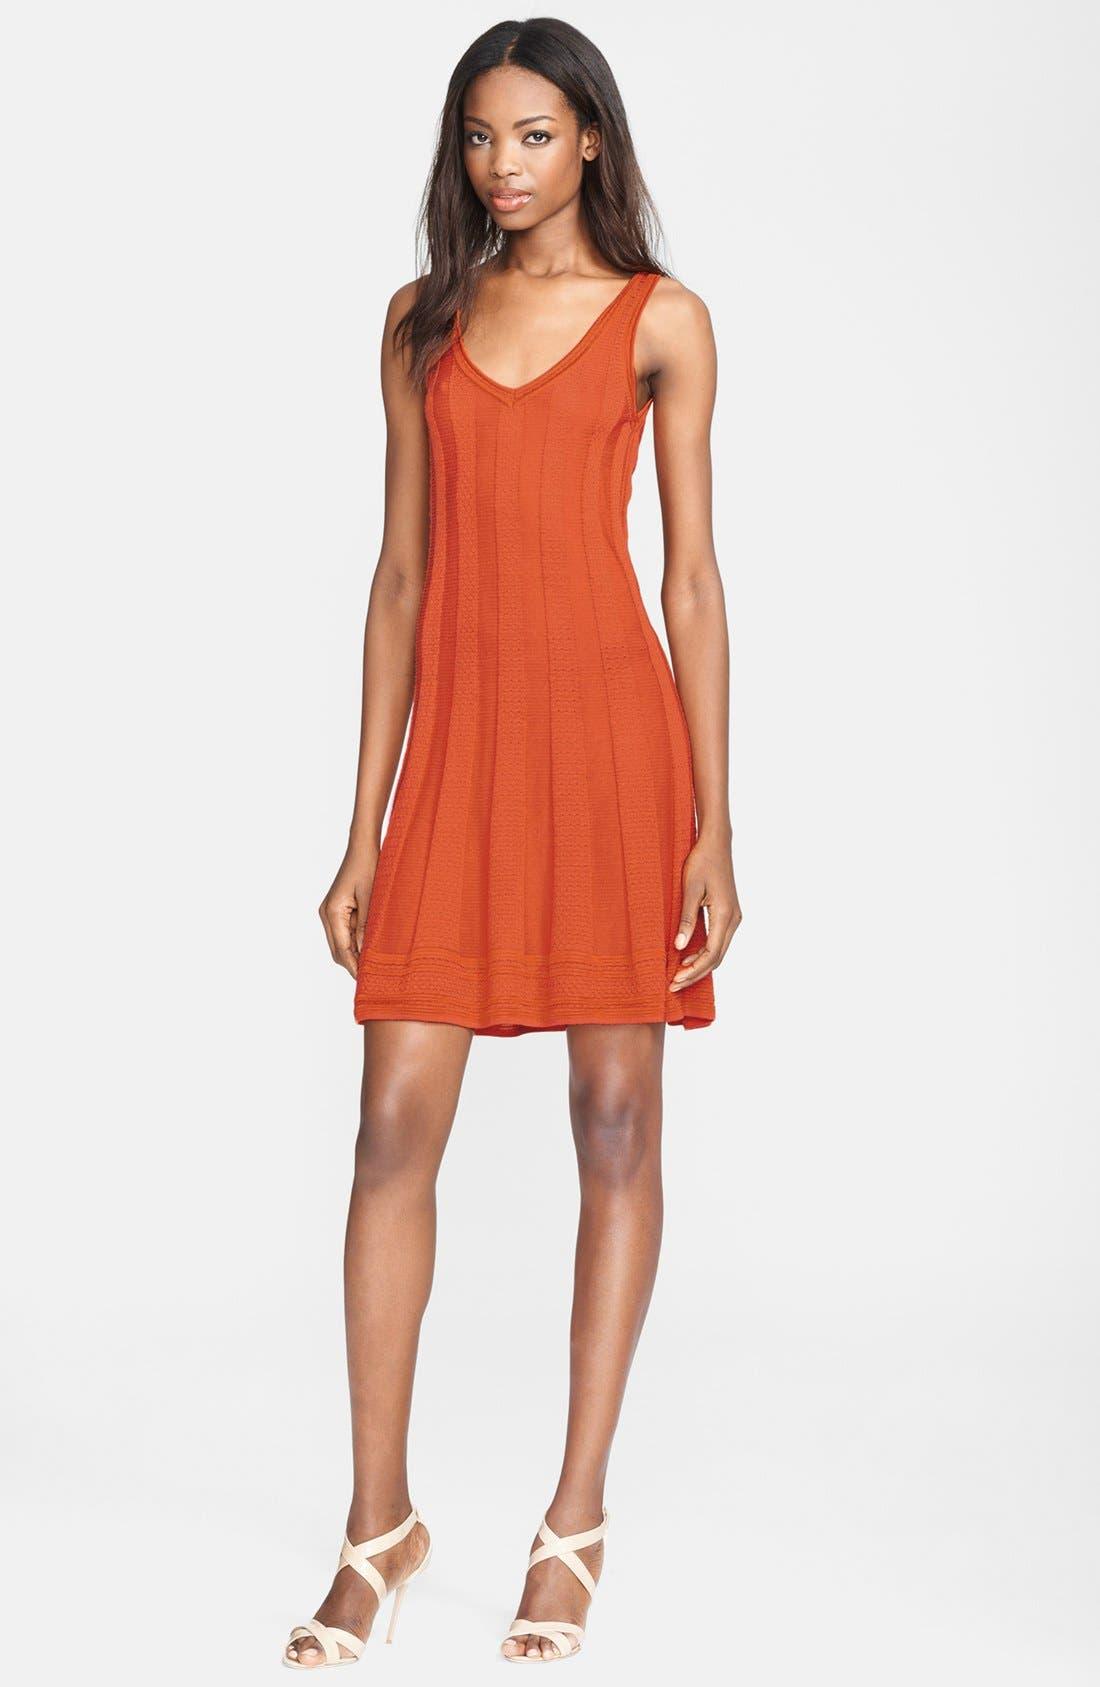 Main Image - M Missoni Sleeveless V-Neck Knit Dress